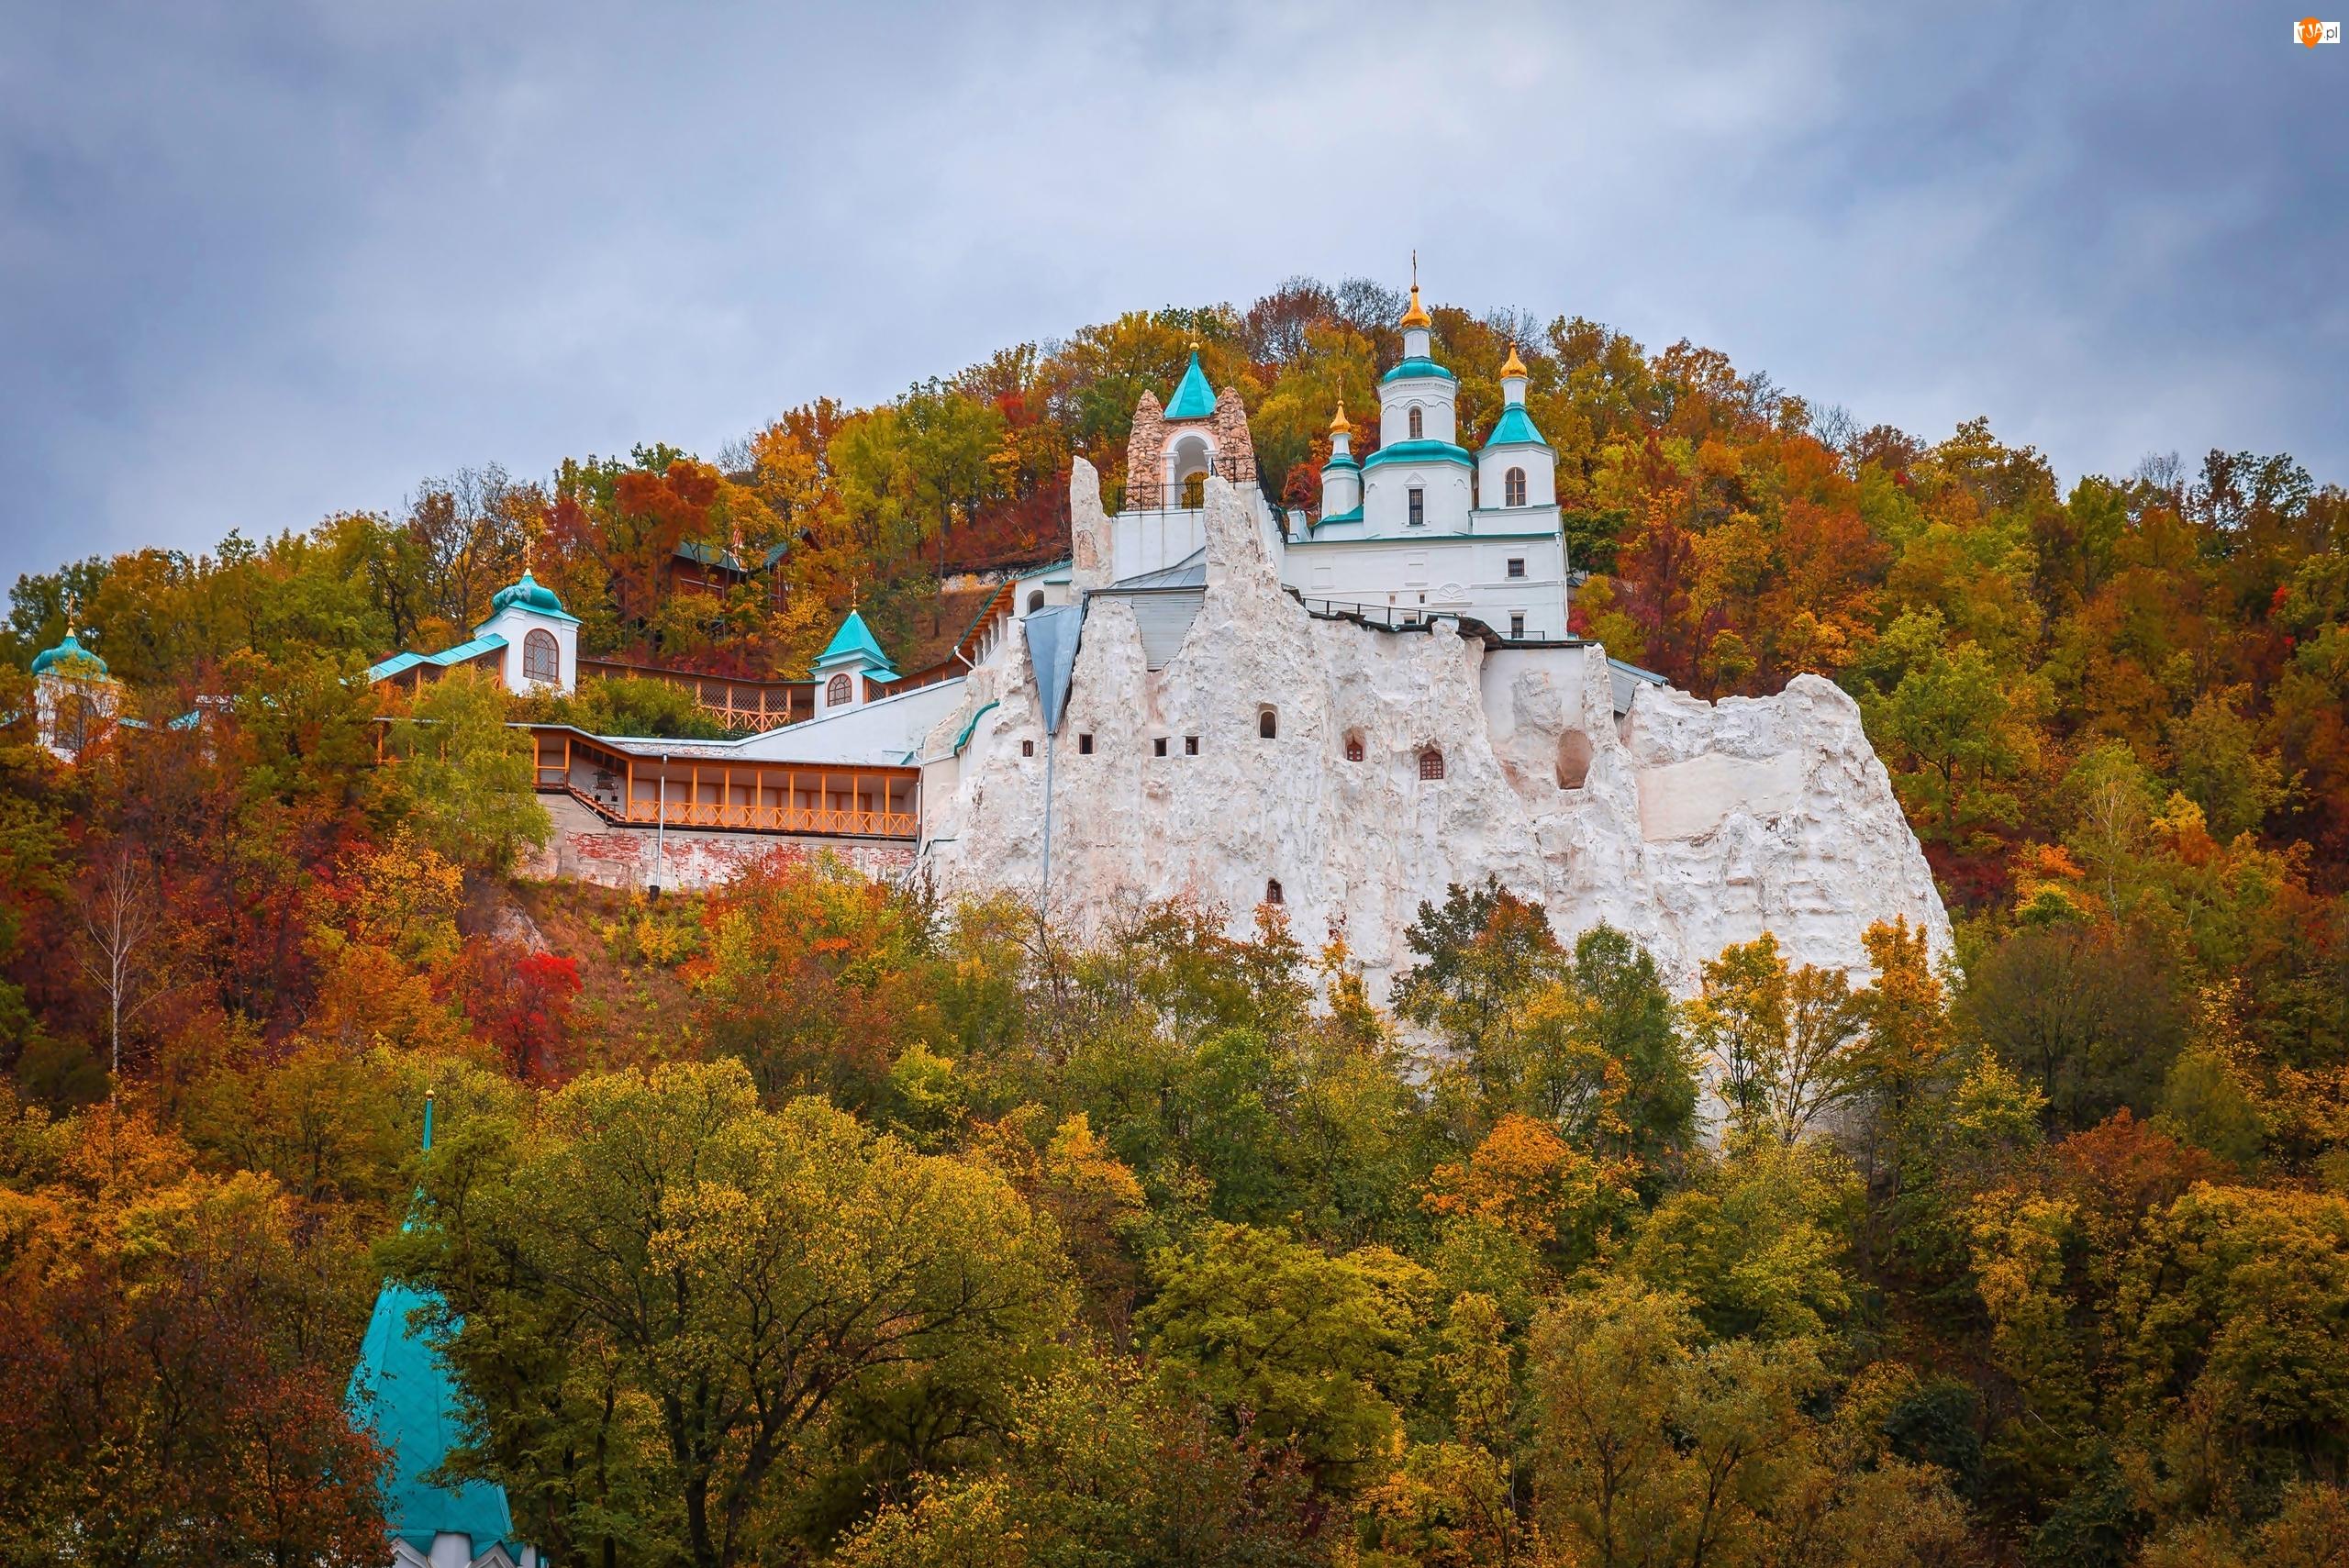 Jesień, Ukraina, Klasztor, Ławra Świętogórska, Lasy